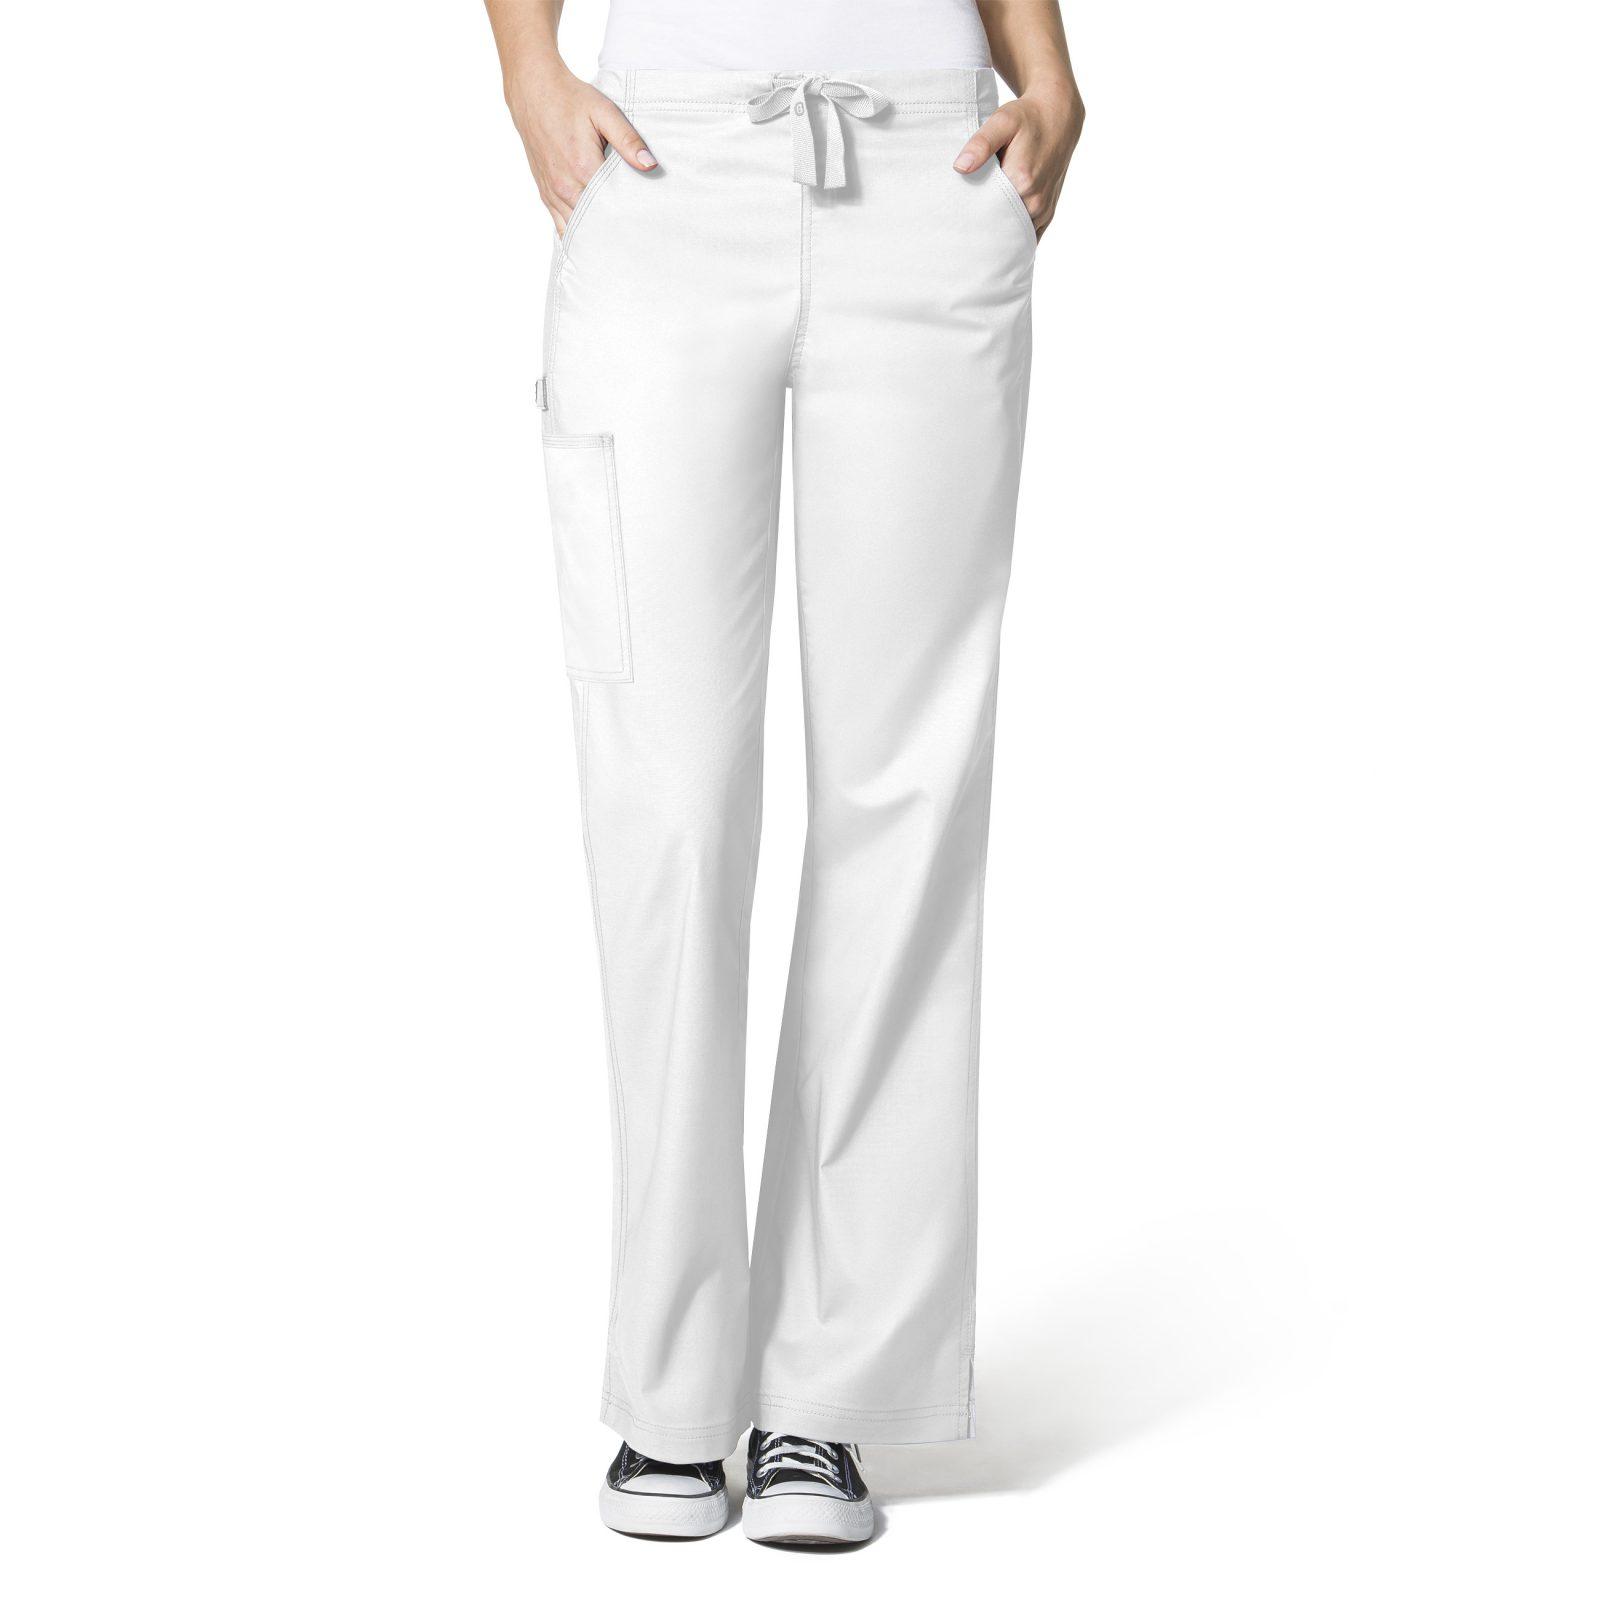 WONDERFLEX FLARE LEG CARGO PANT WHITE